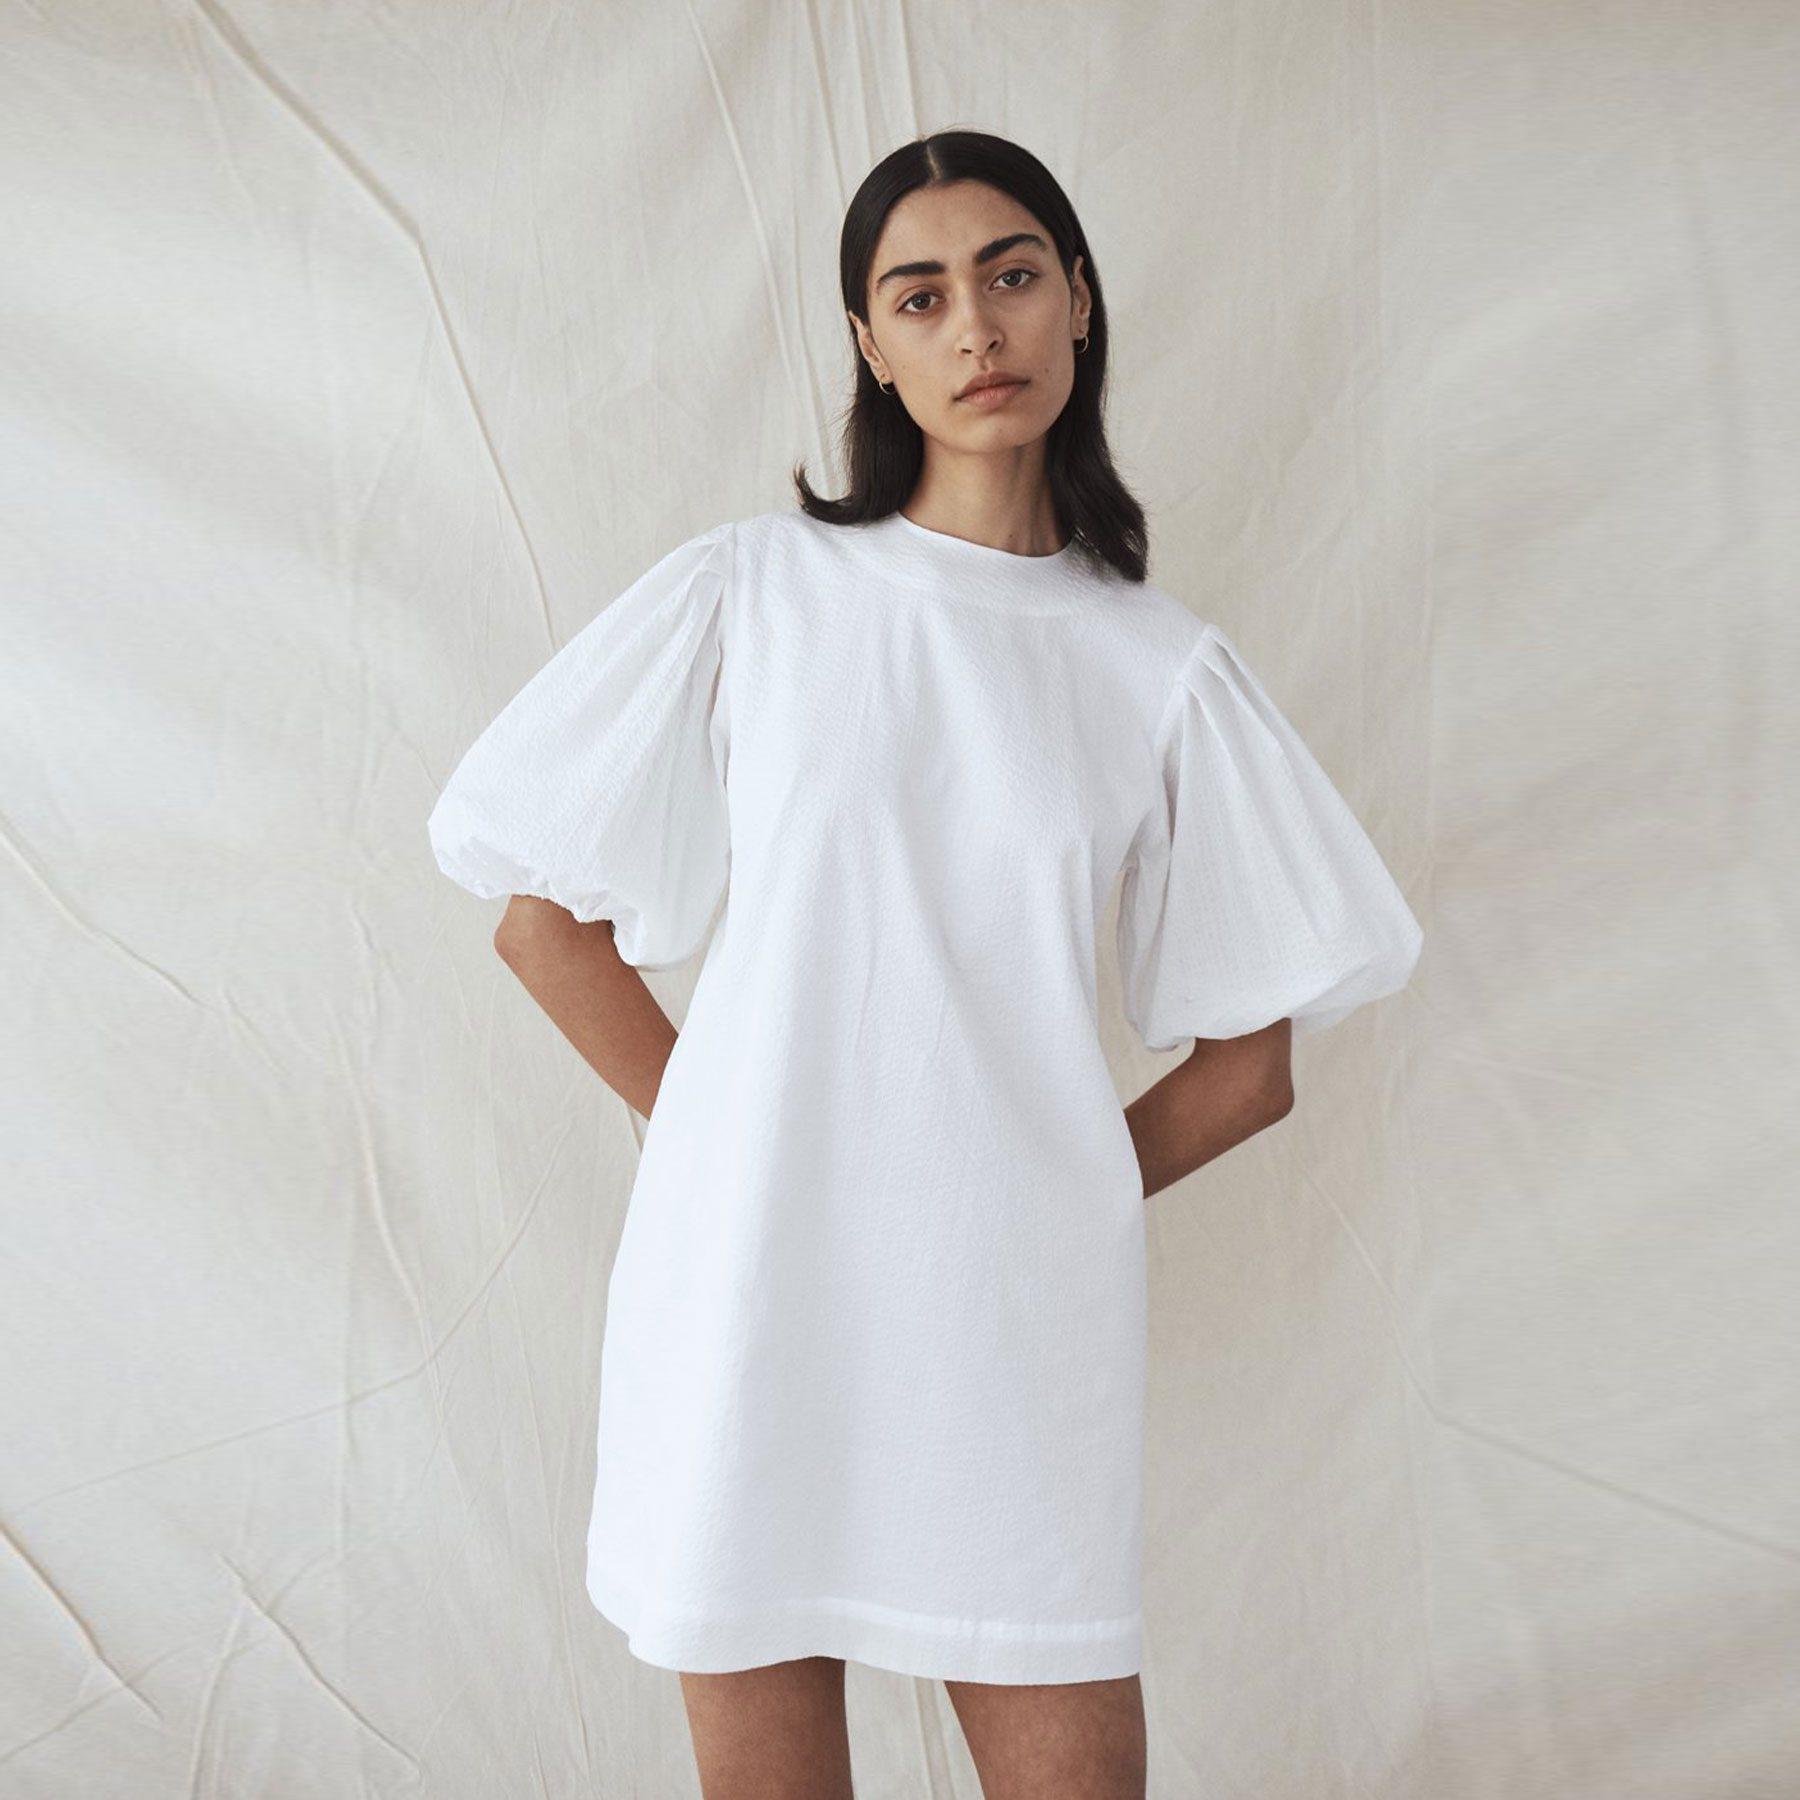 Matin-Gathered-Sleeve-Mini-Dress-1